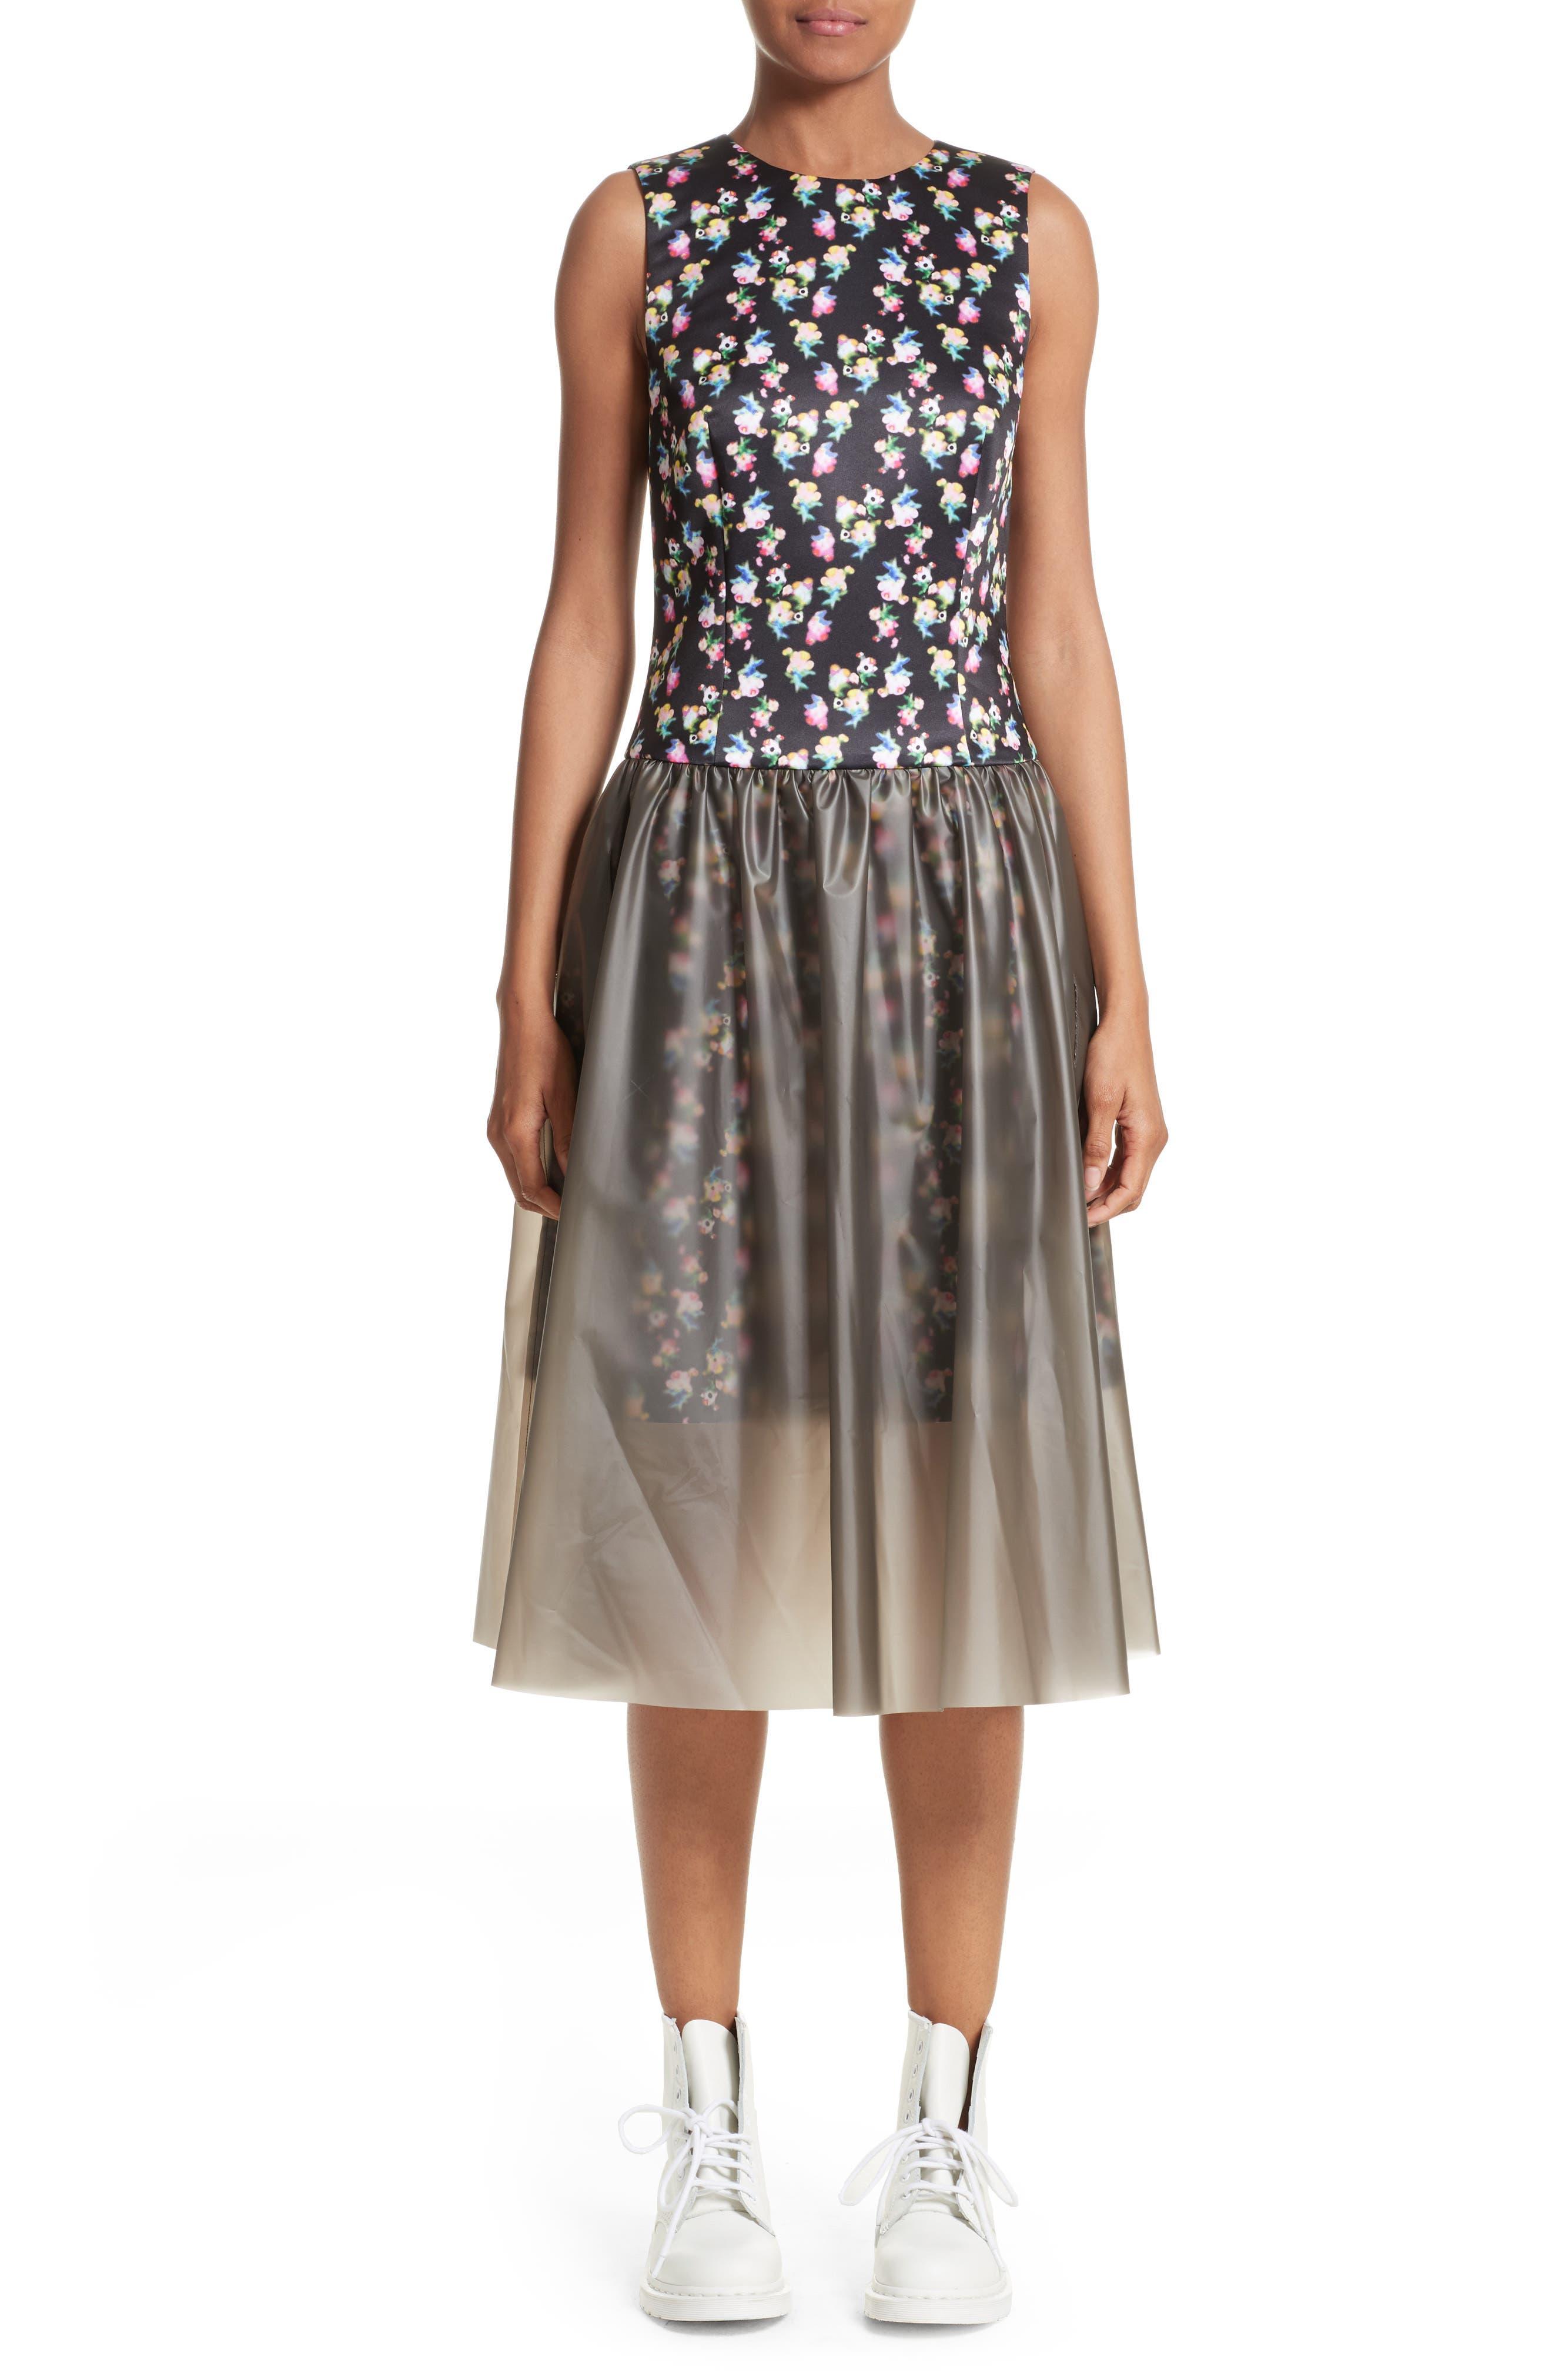 PASKAL Floral Print Fit & Flare Dress with Vinyl Skirt